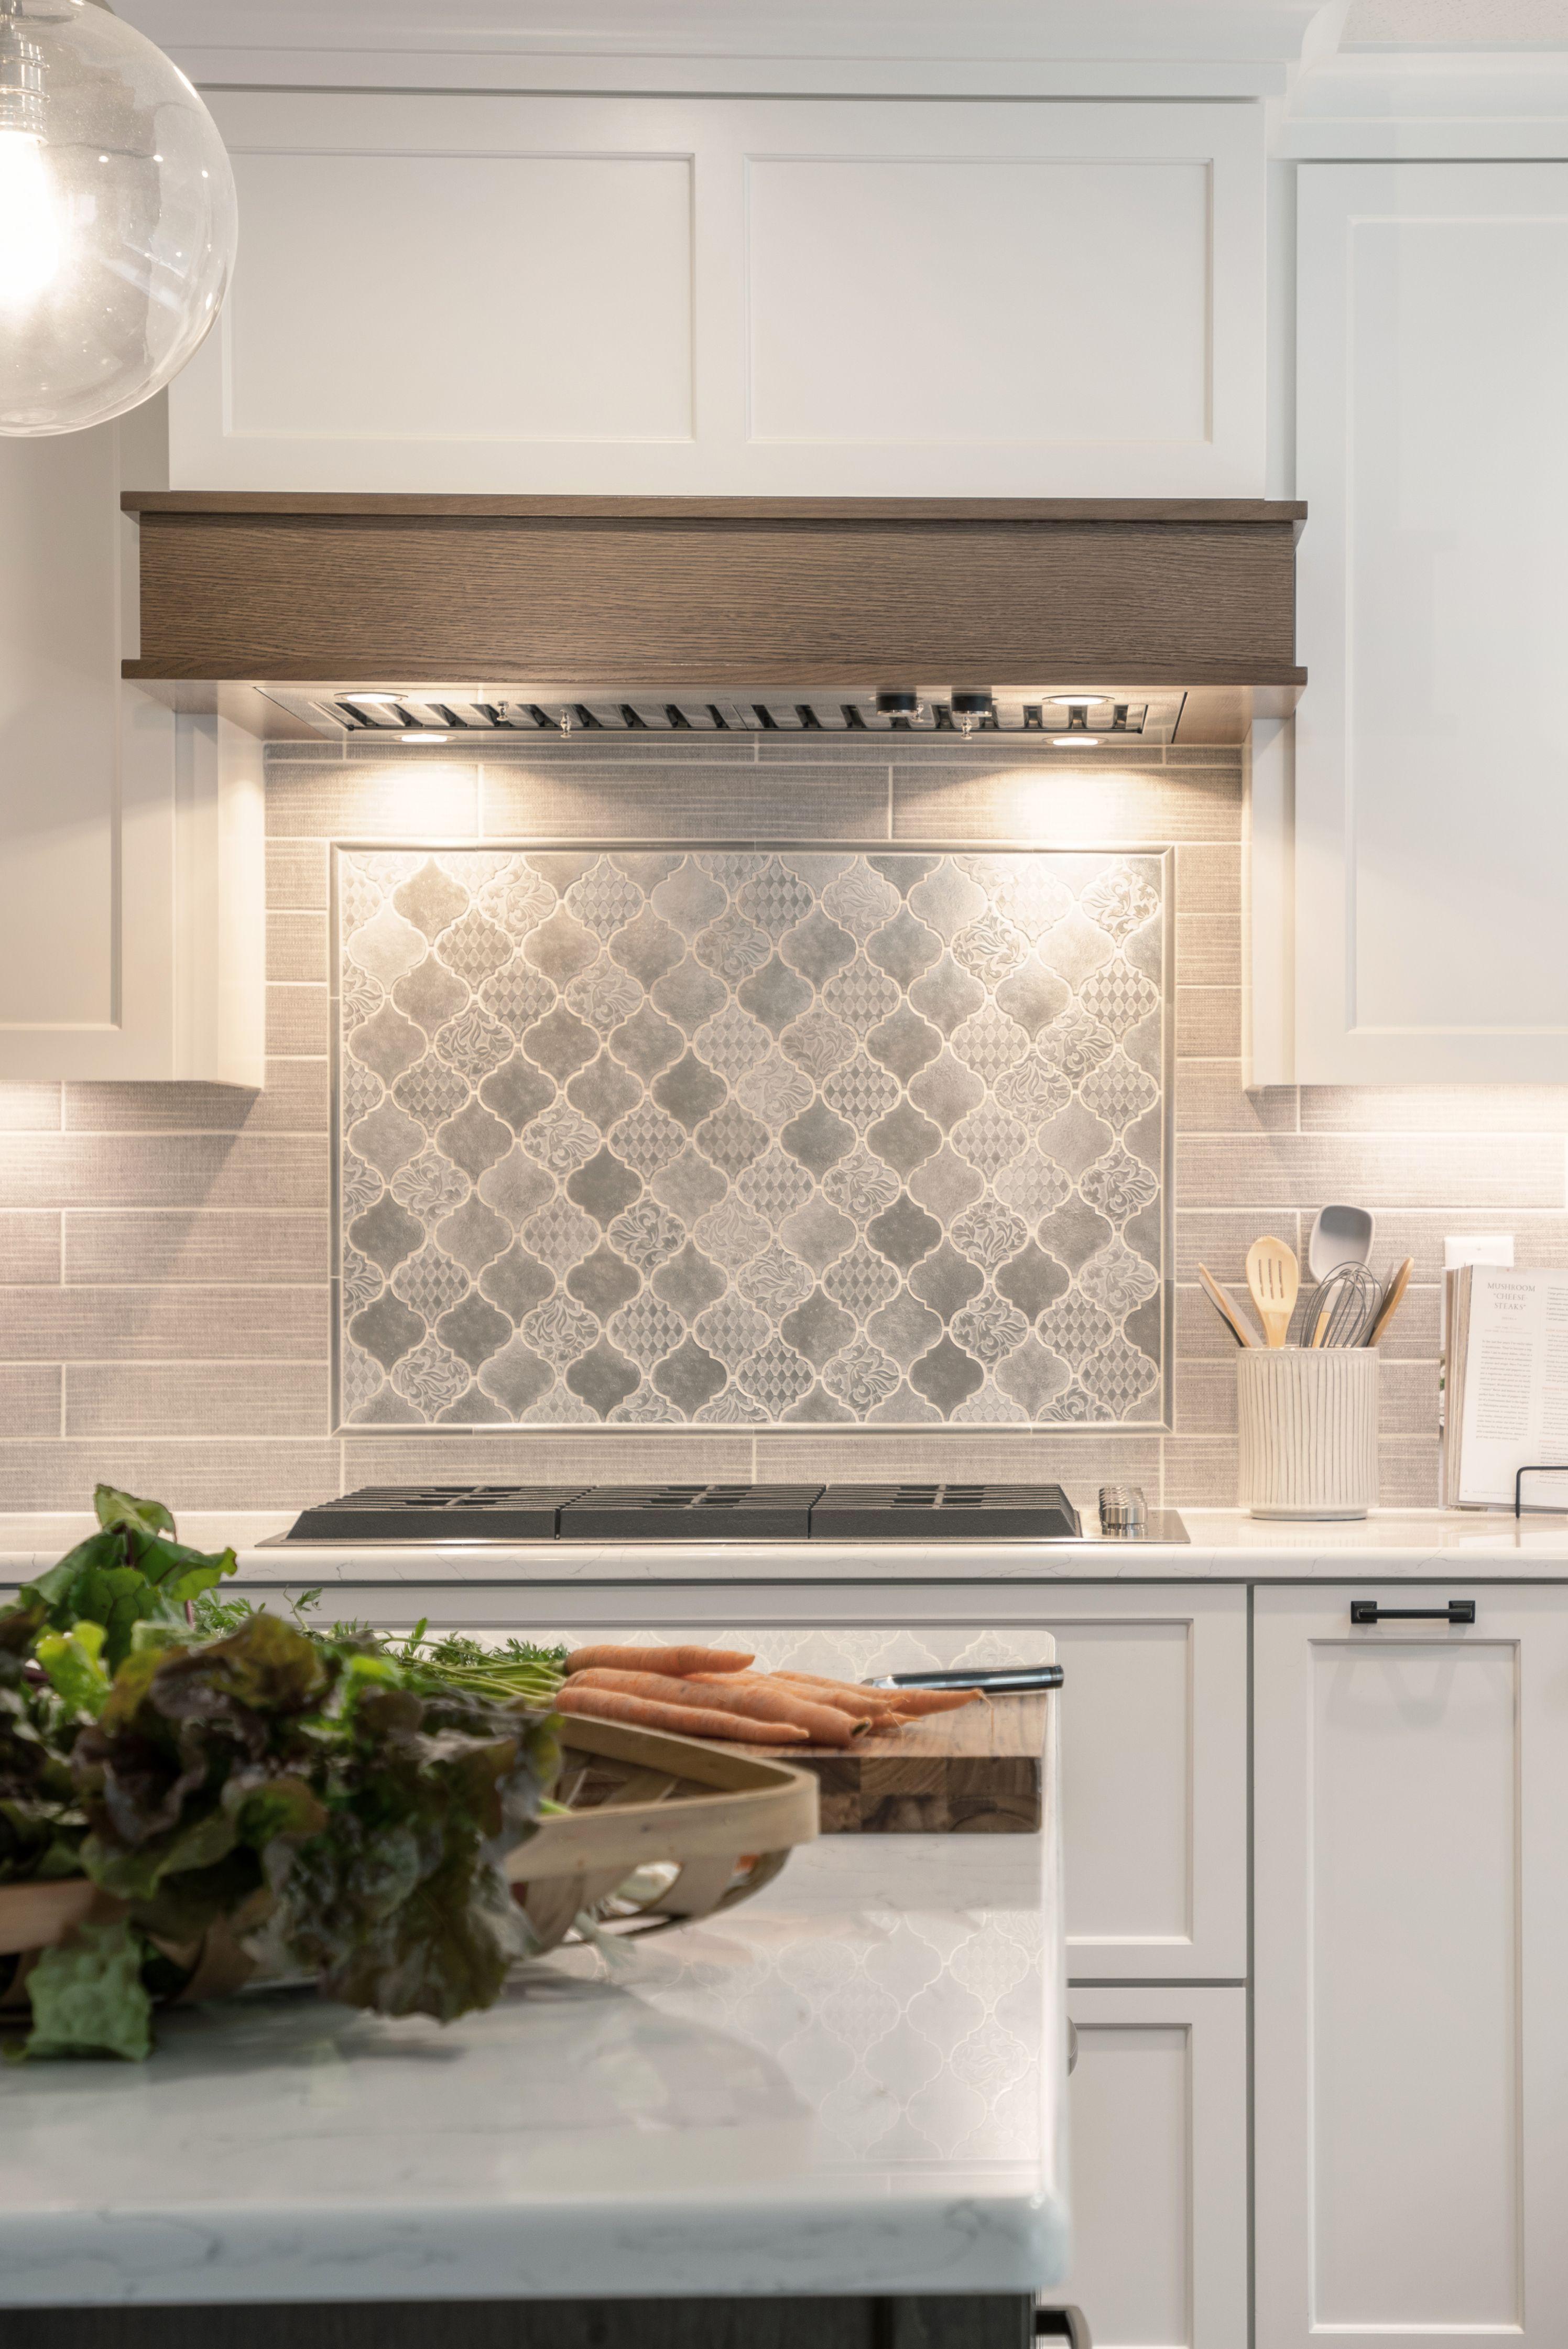 White Kitchen Cabinets With Gray Backsplash Tile Gray Kitchen Backsplash Kitchen Backsplash Designs Kitchen Cabinets Grey And White Decorative backsplash for kitchen